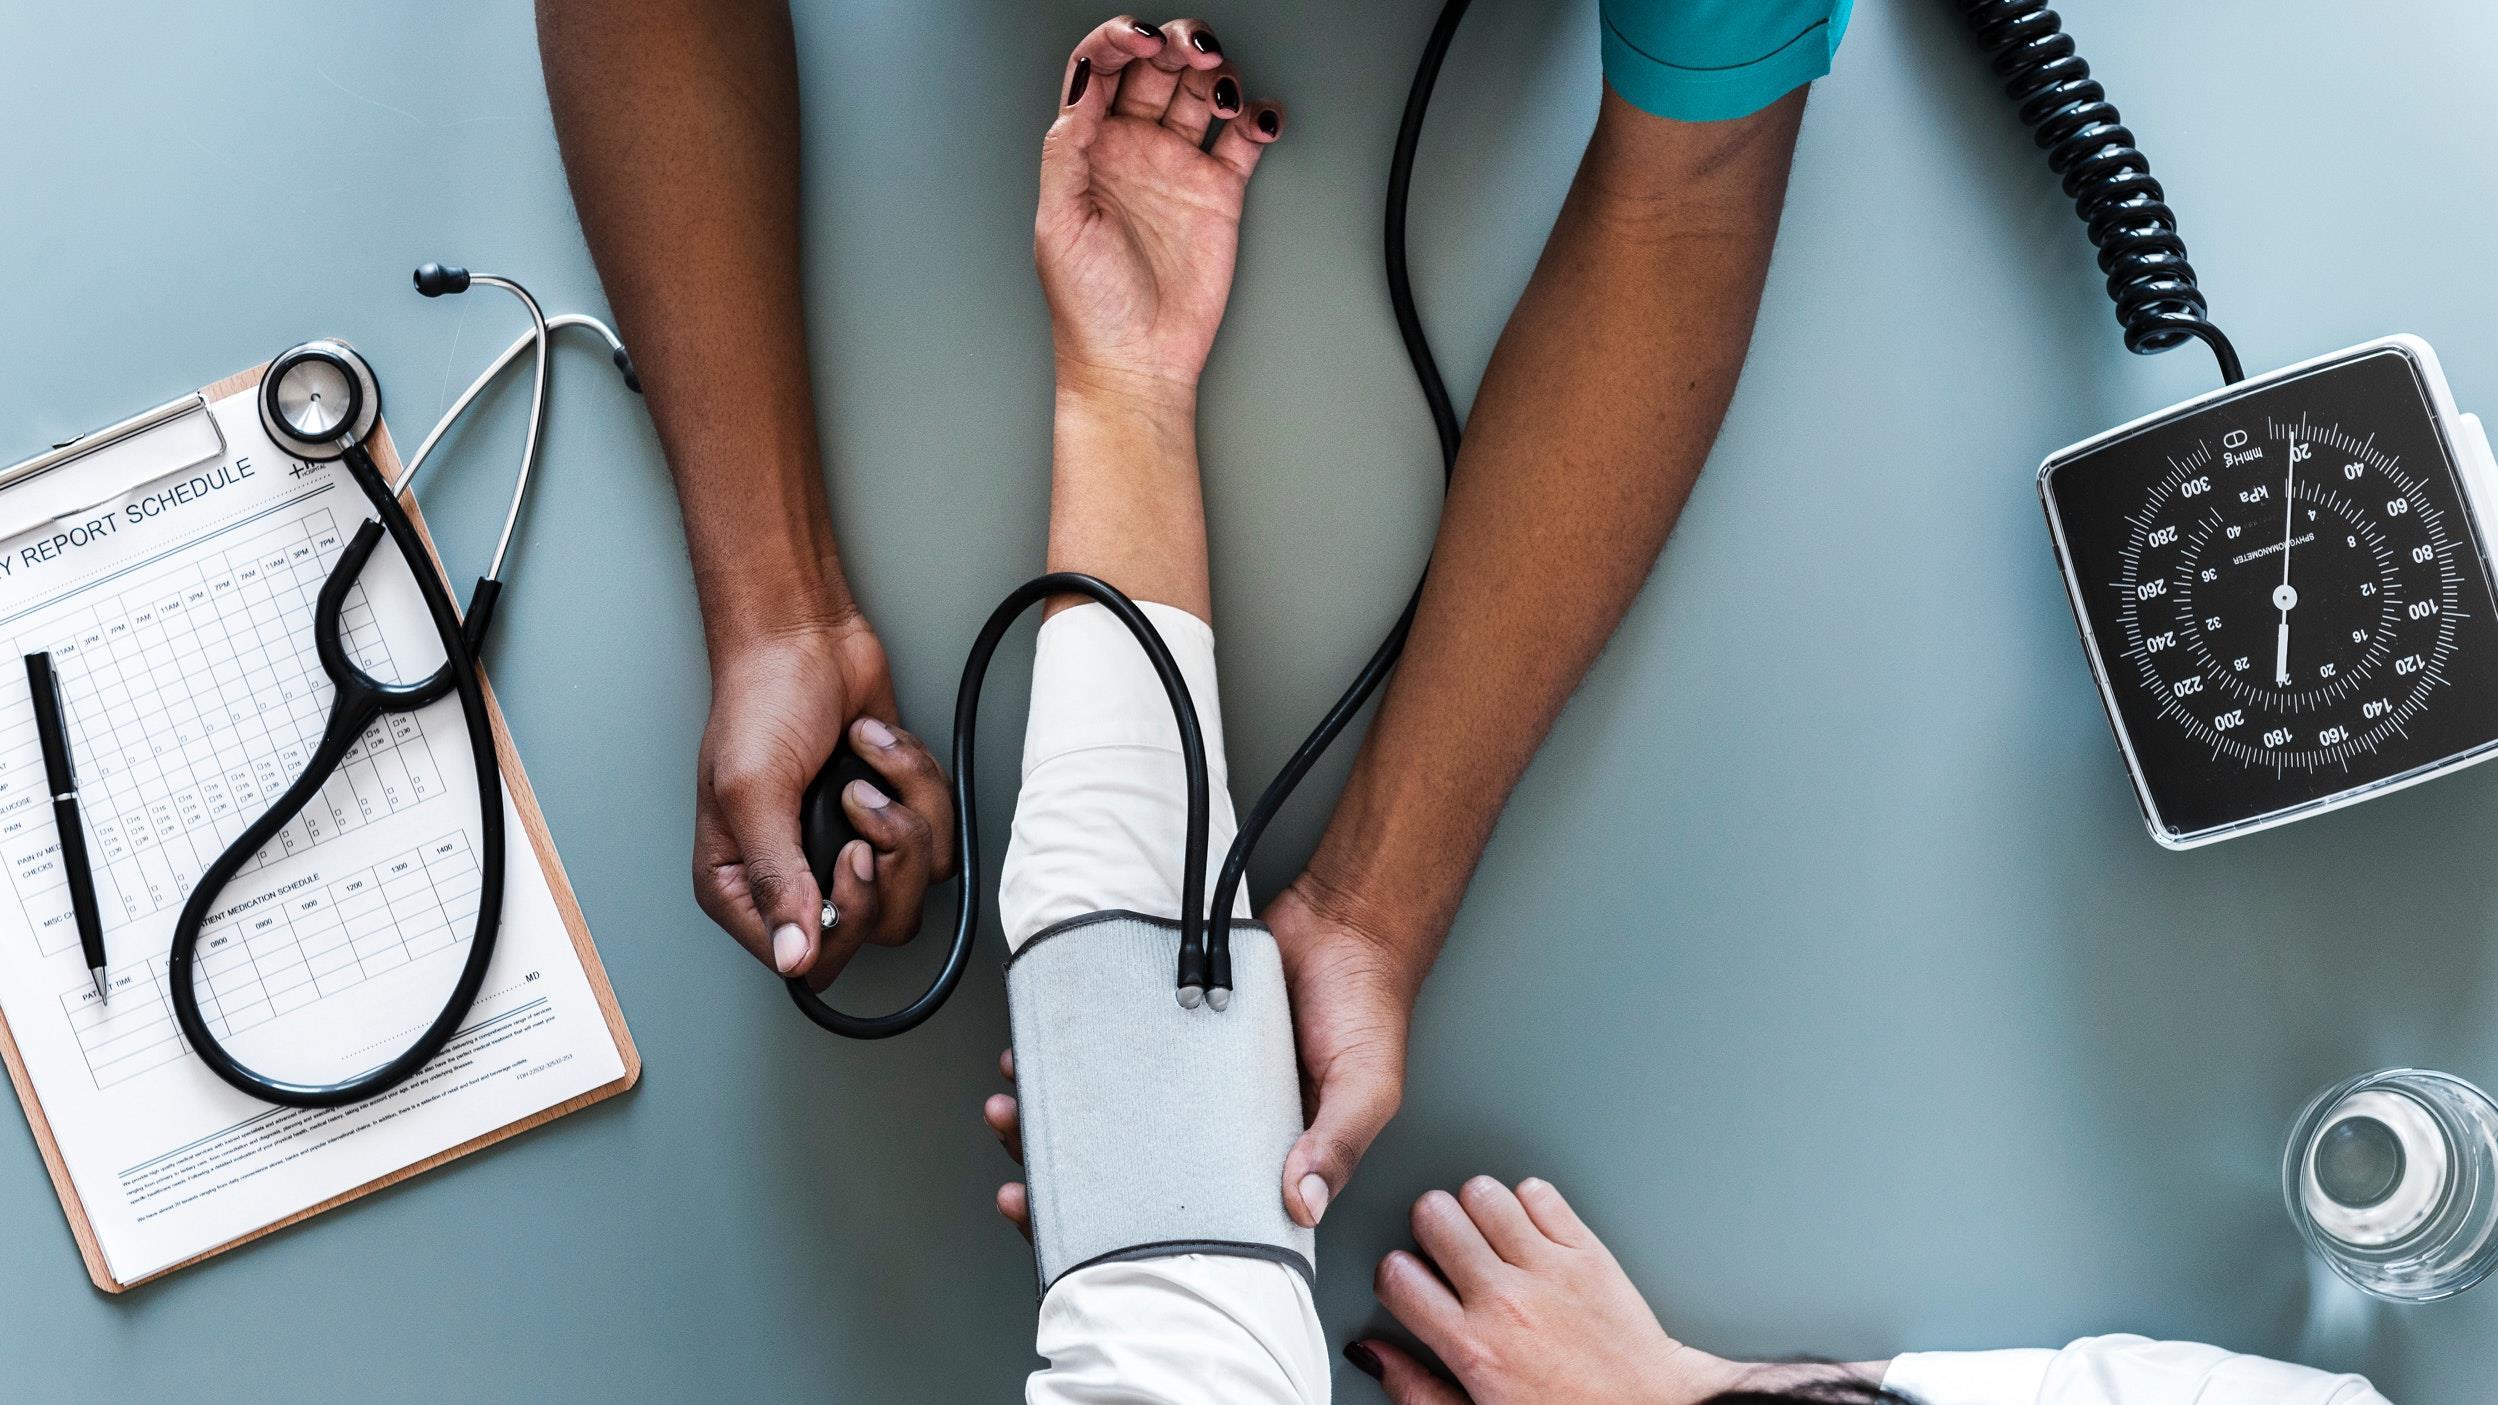 gyakorolja a magas vérnyomás nyomását